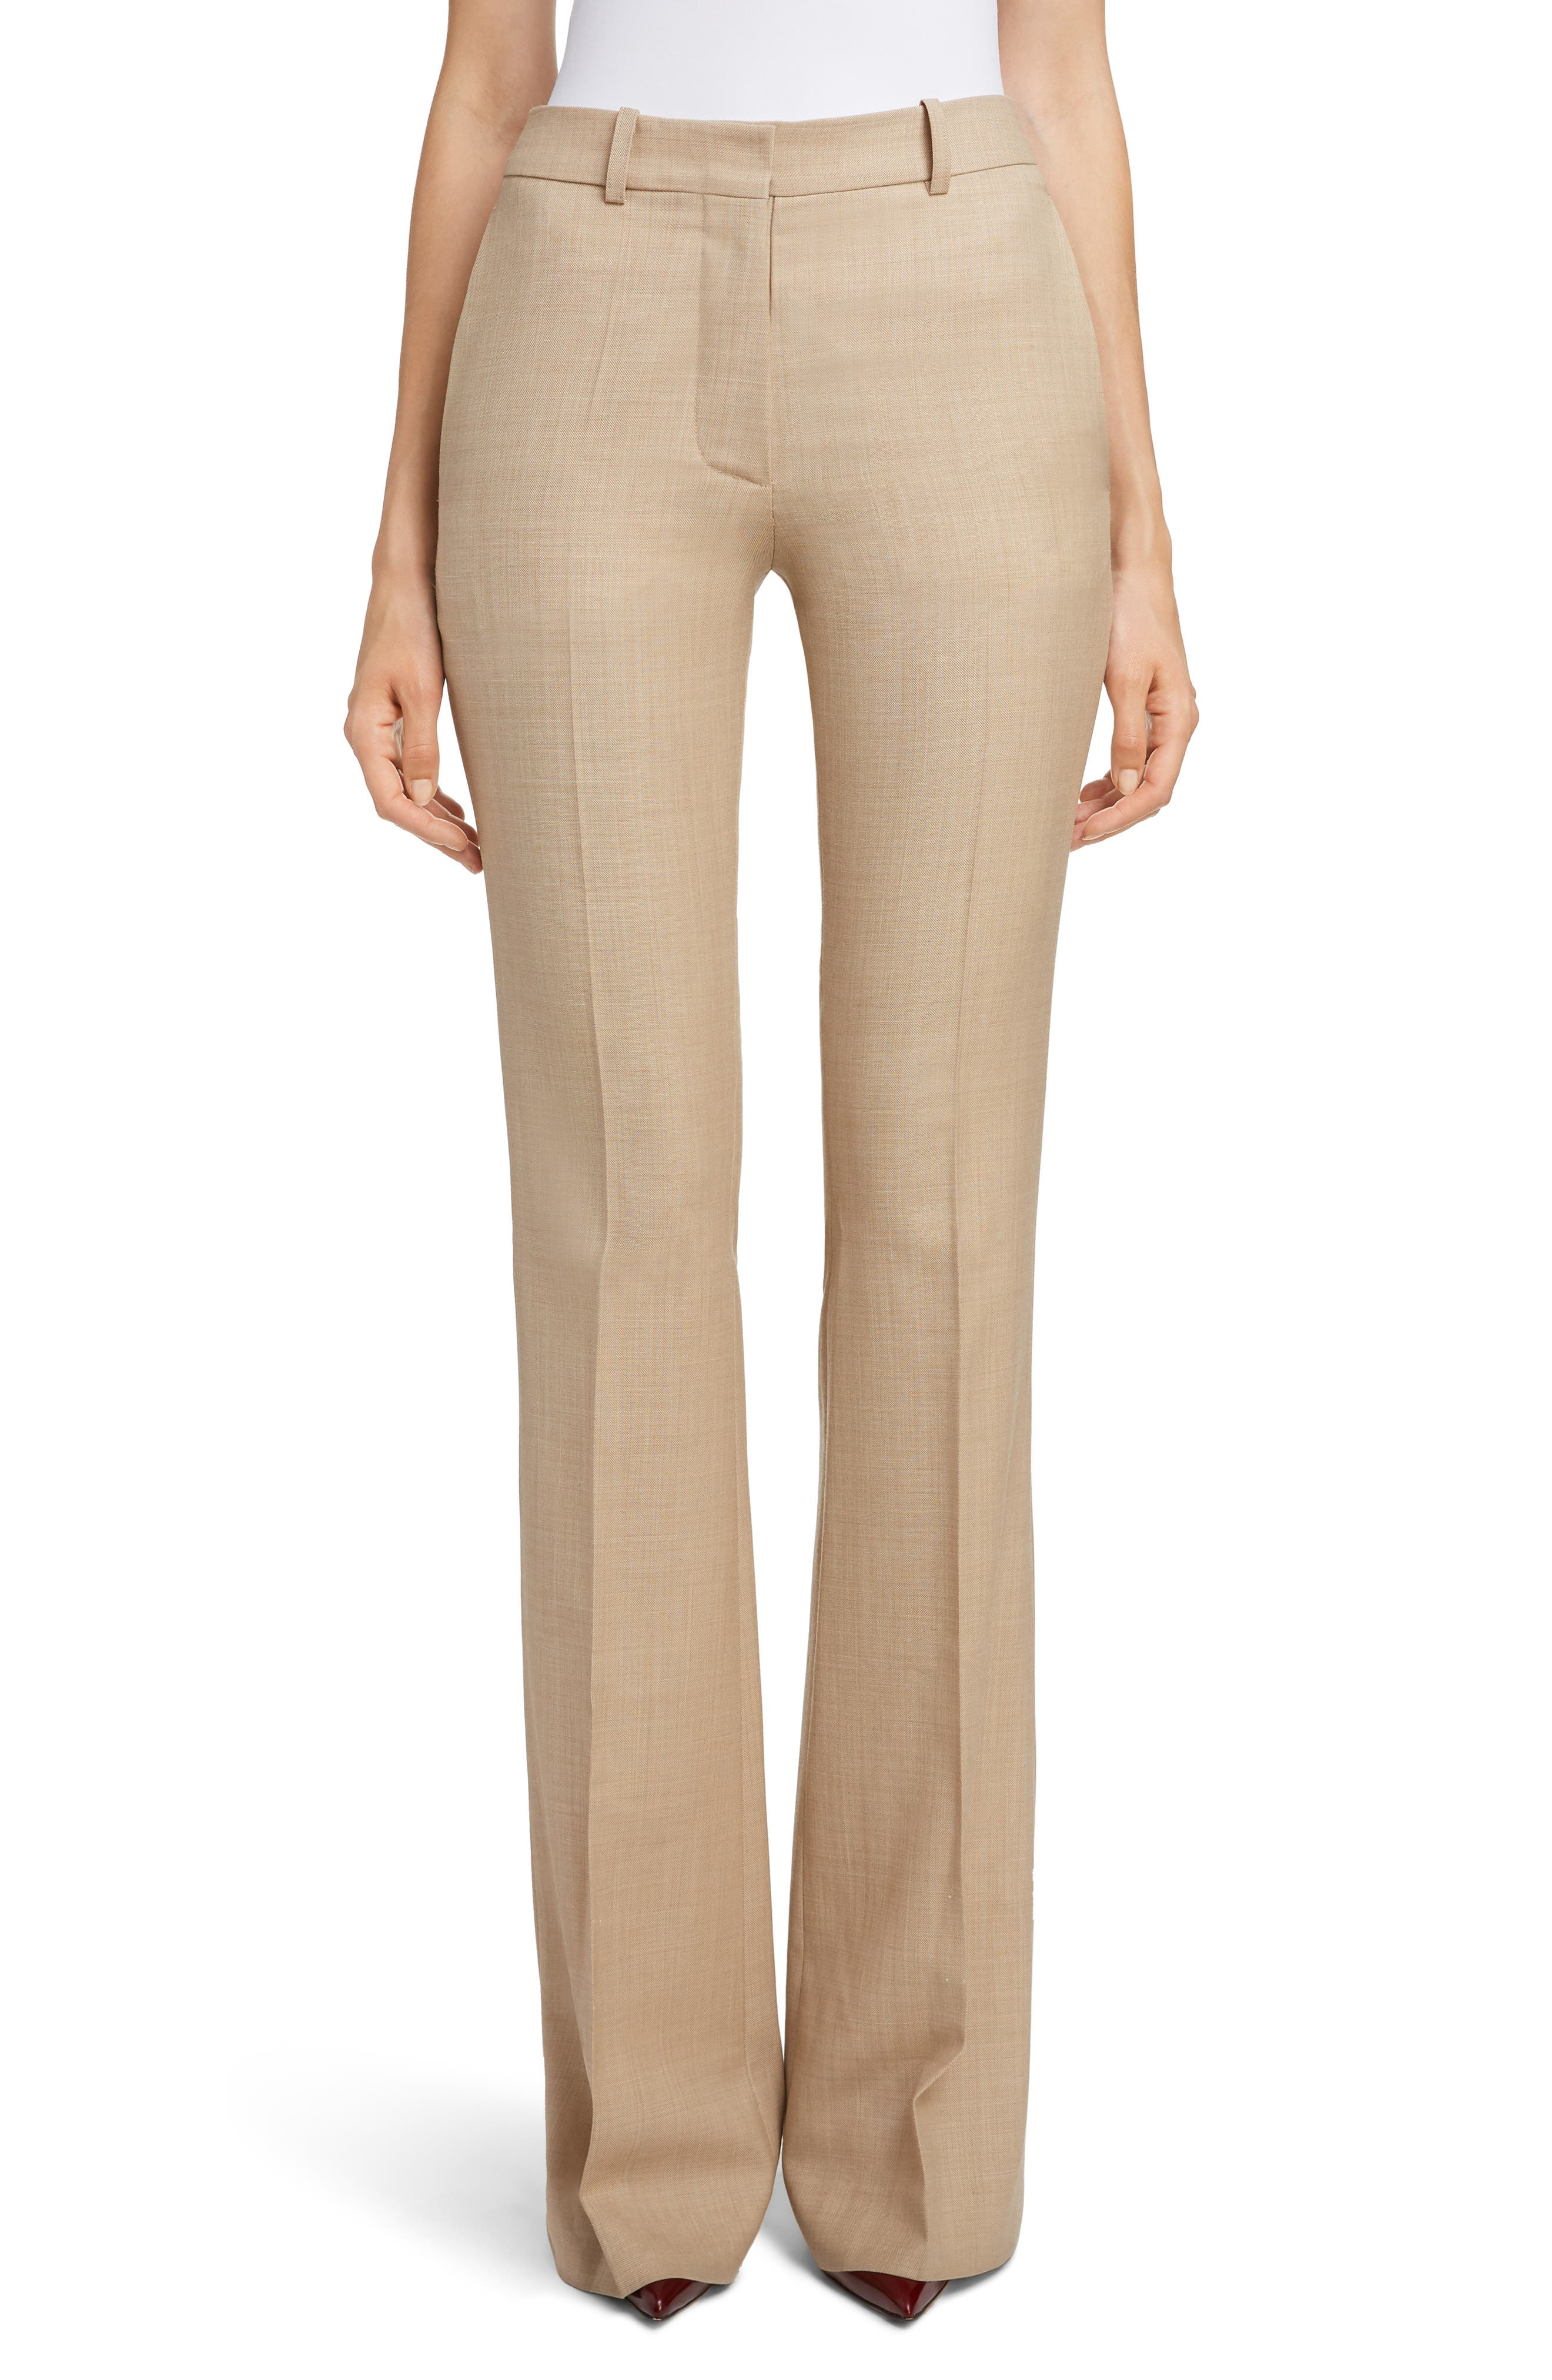 VICTORIA BECKHAM High Waist Flare Wool Pants, Main, color, LIGHT BEIGE-WHITE